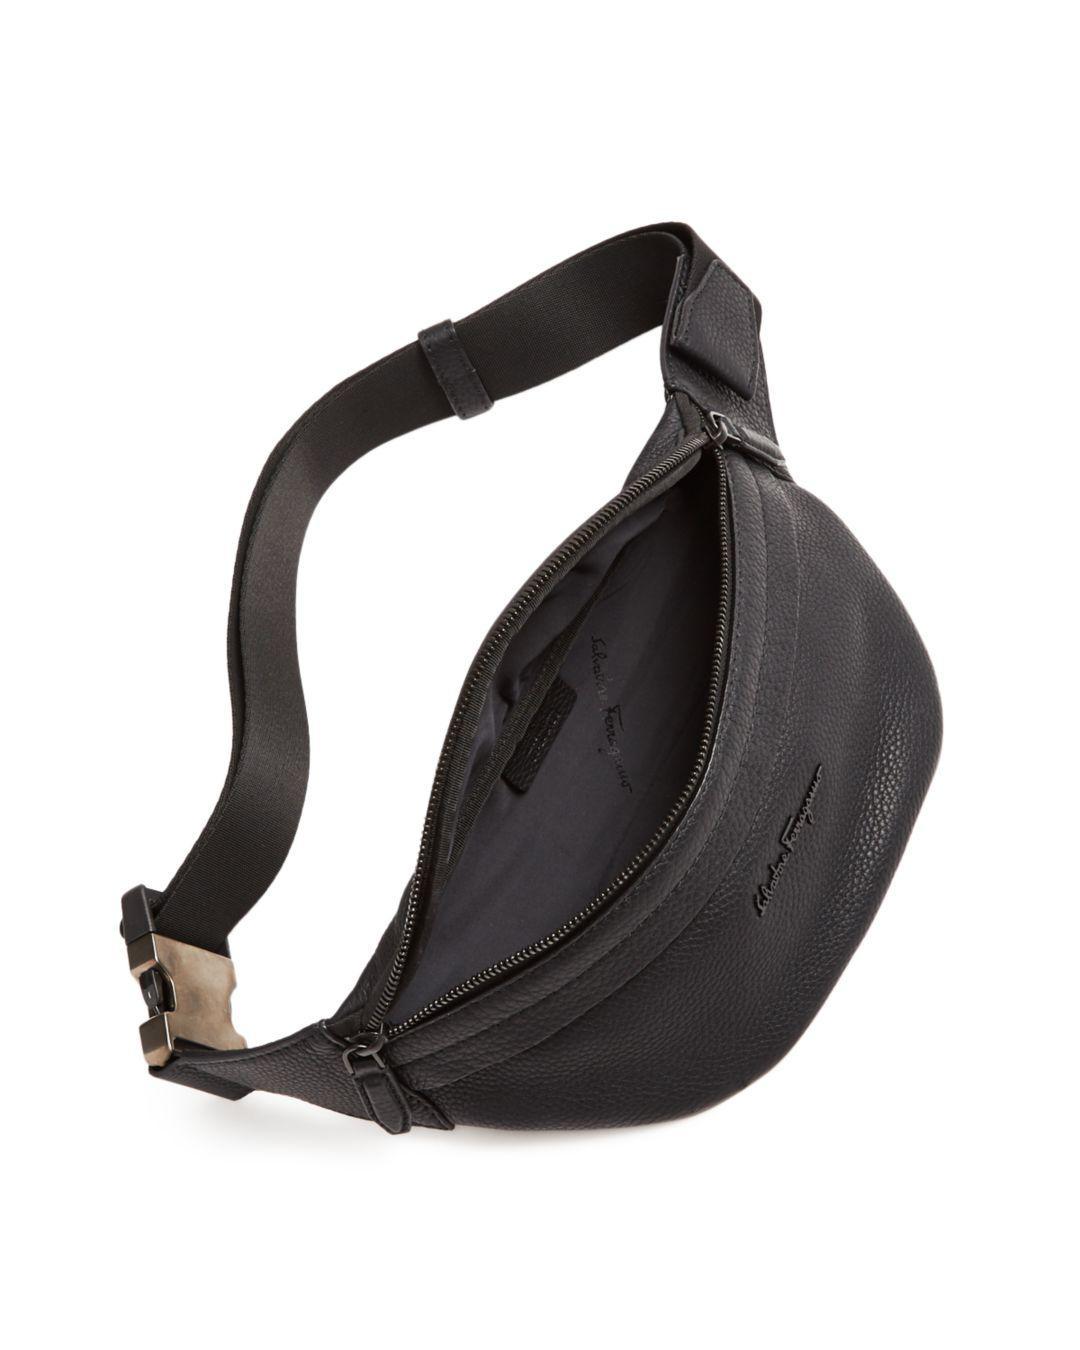 Lyst - Ferragamo Firenze Leather Belt Bag in Black for Men 2ebc231207c40